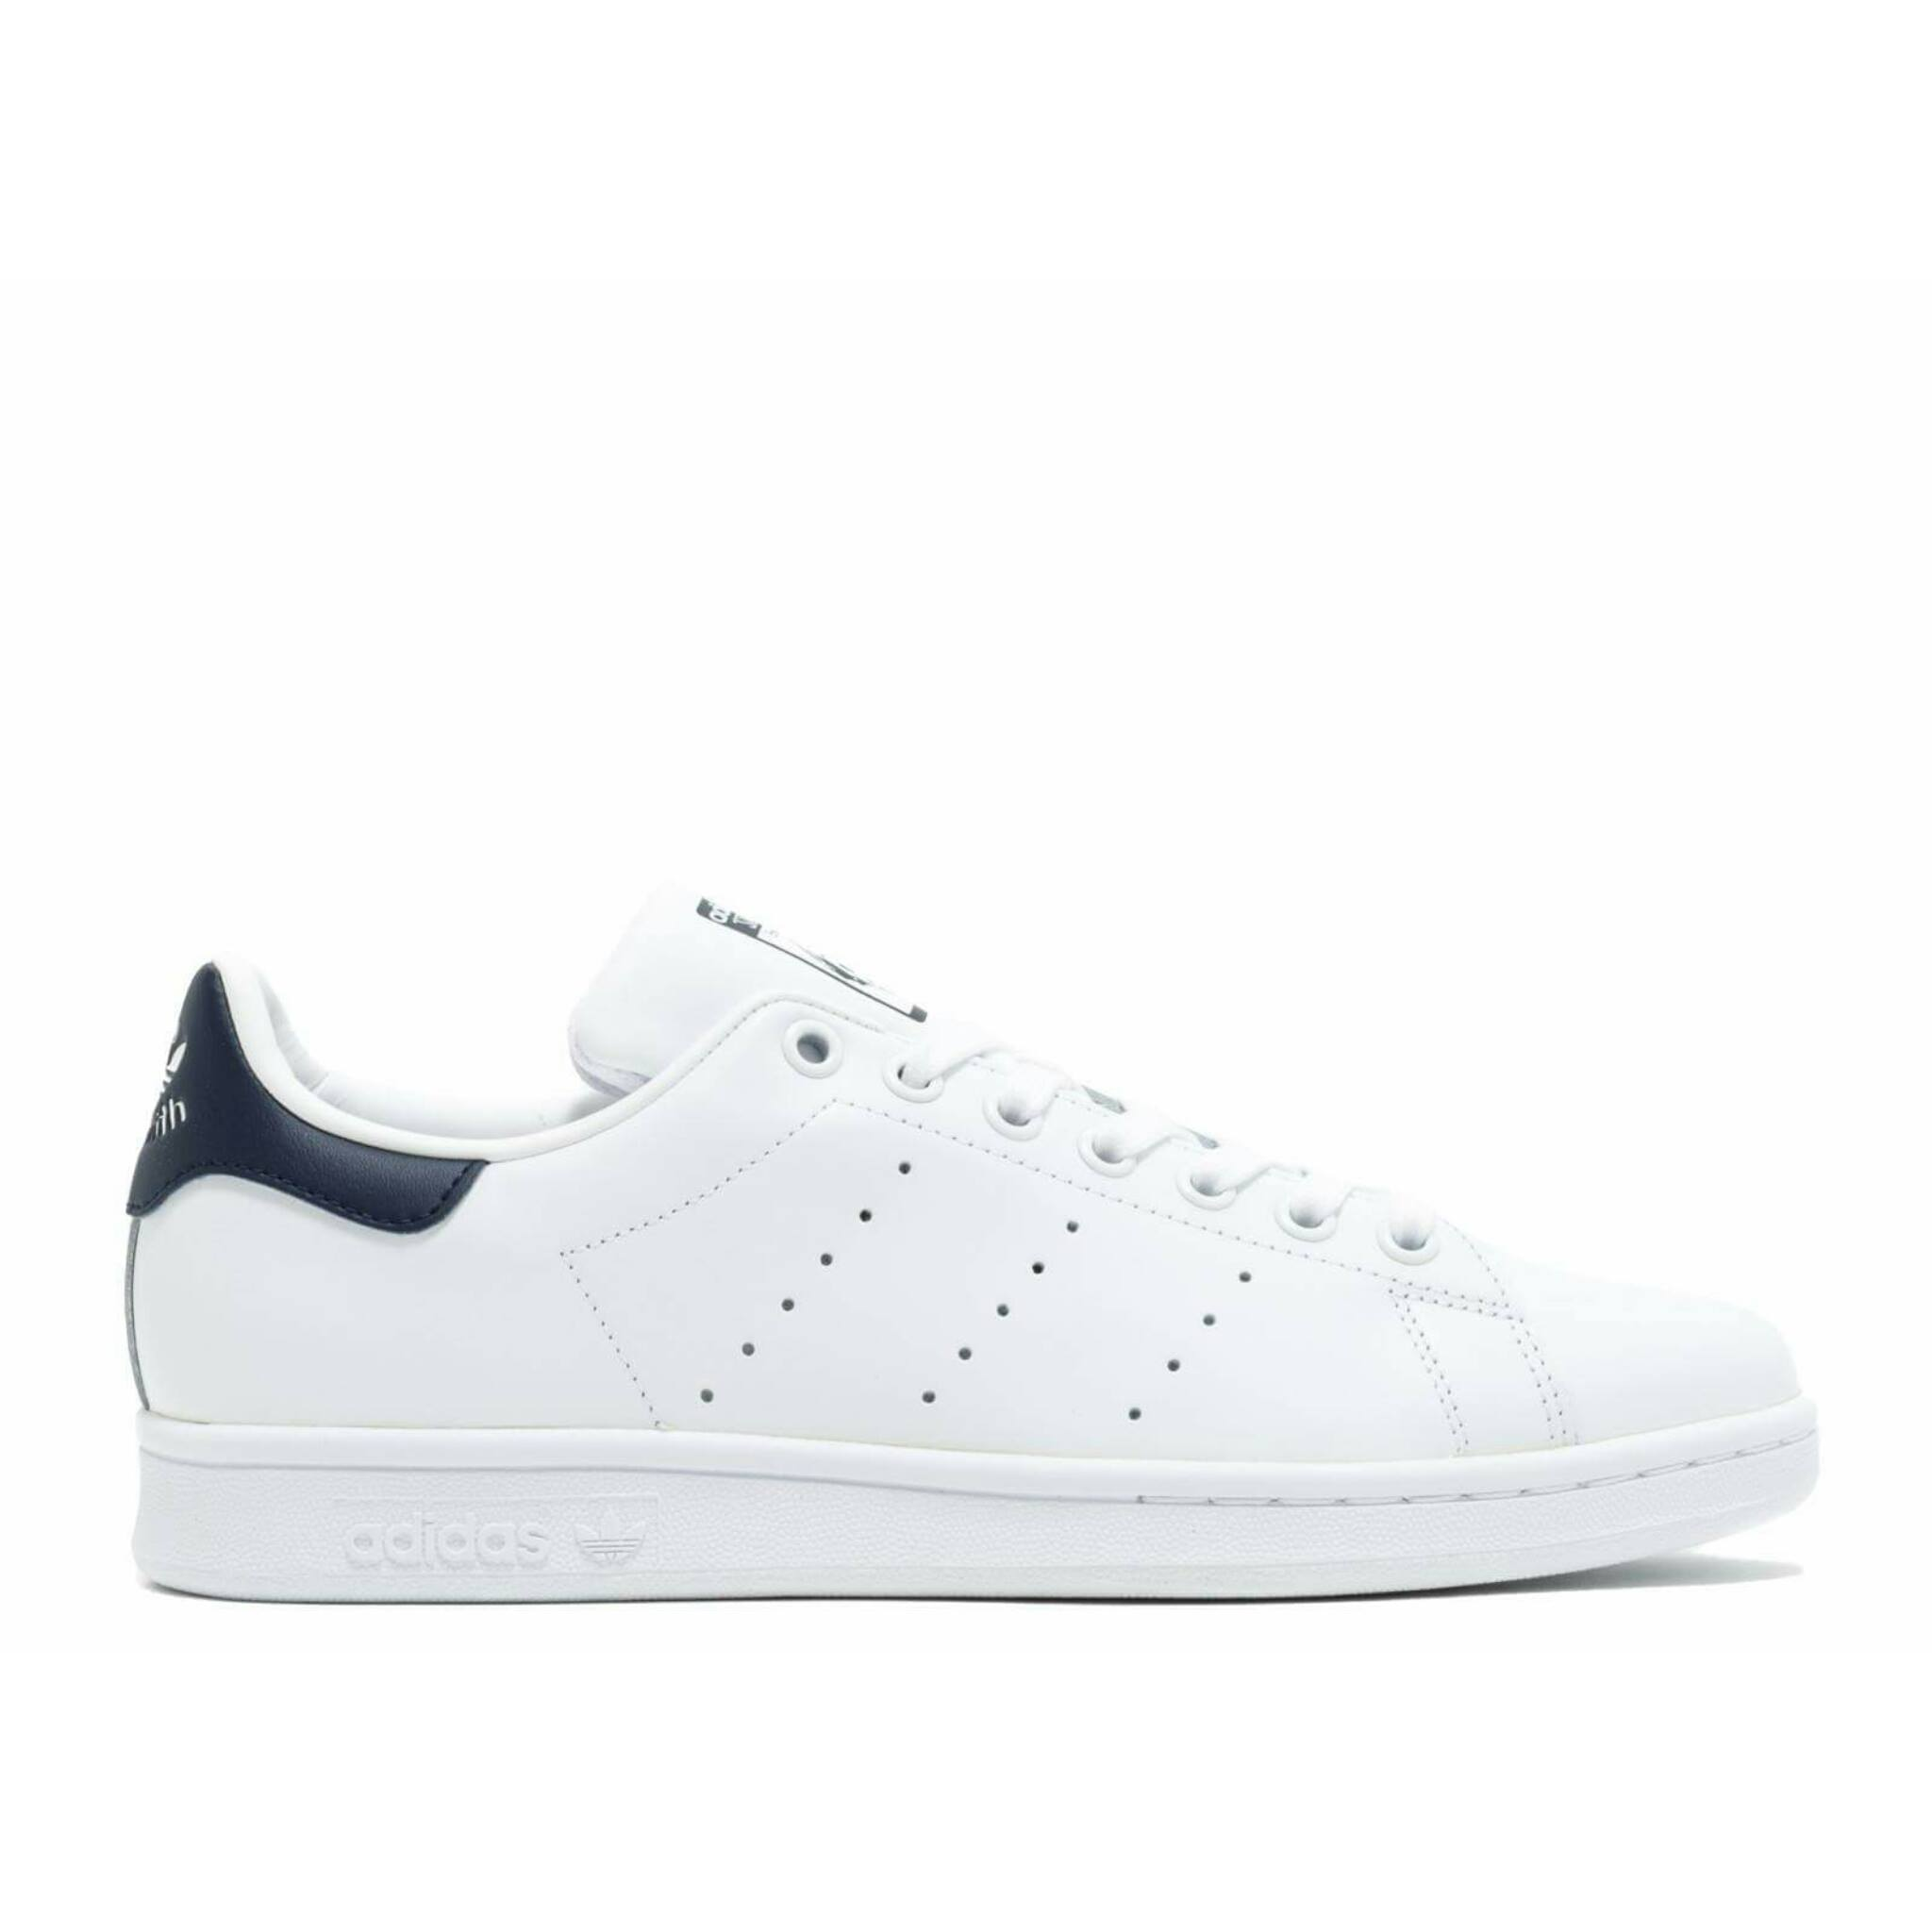 PREMIUM DOT PERFECT PATTERNS ] Shoes